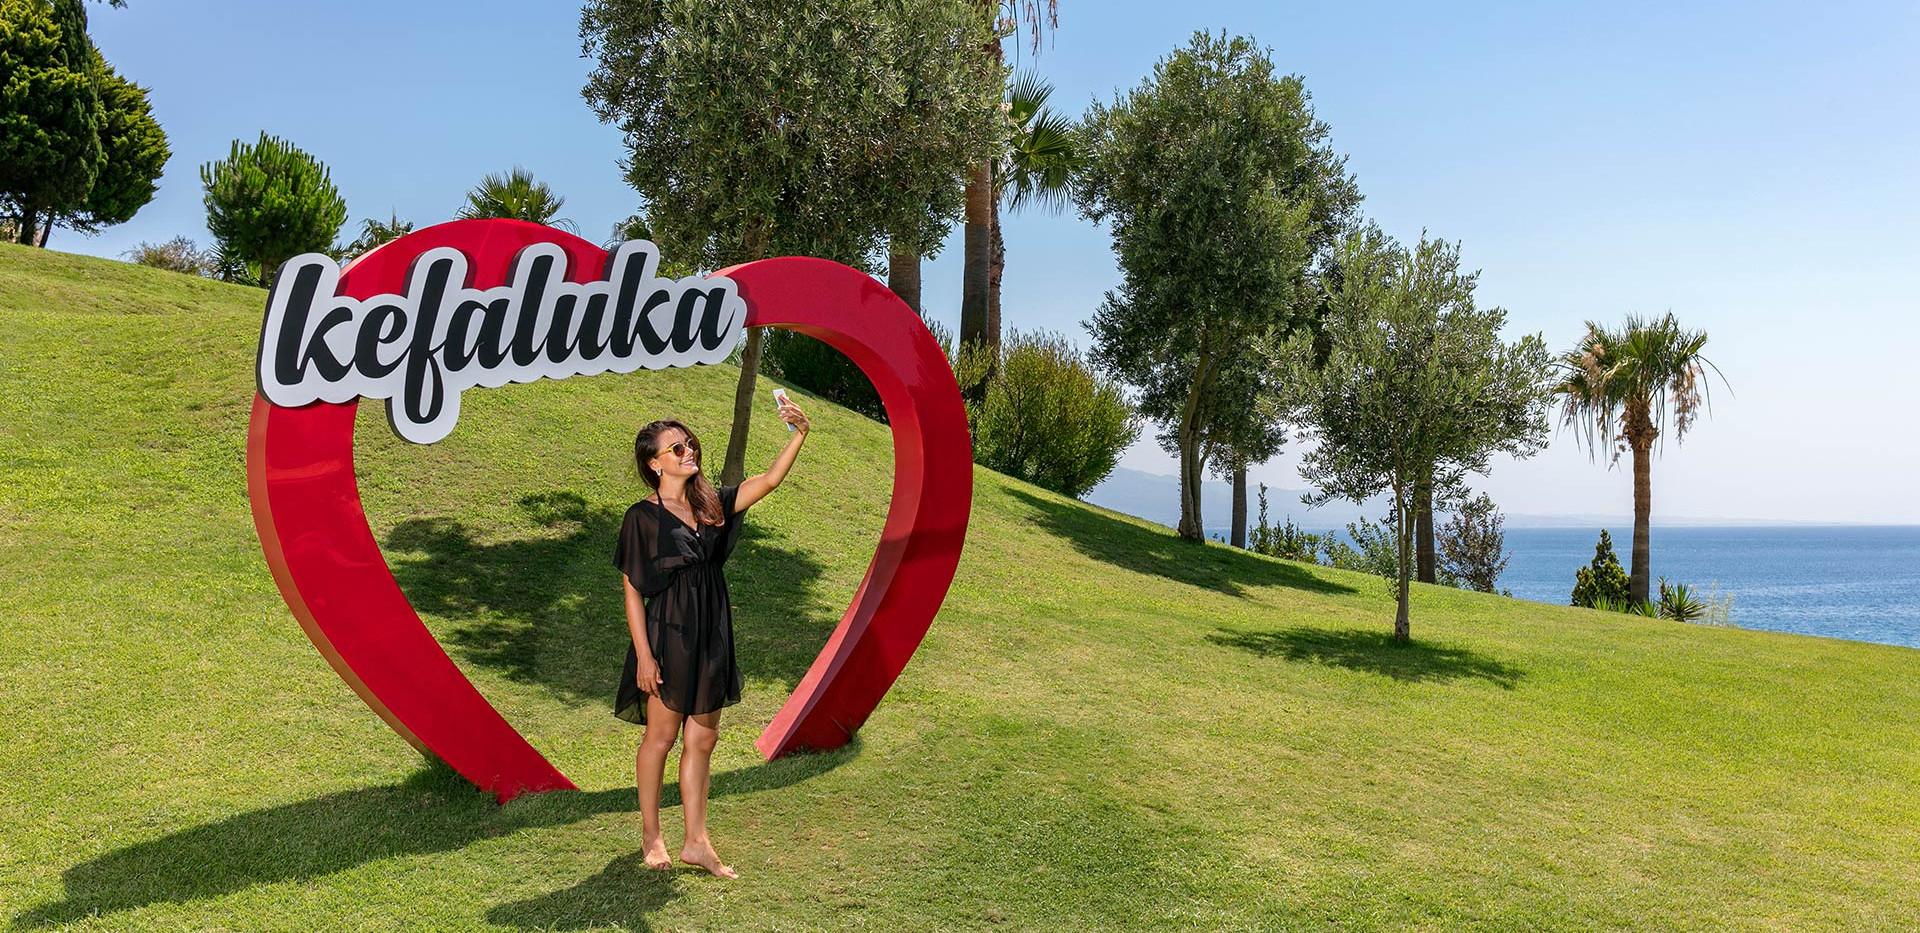 kefaluka_doli_travel_club